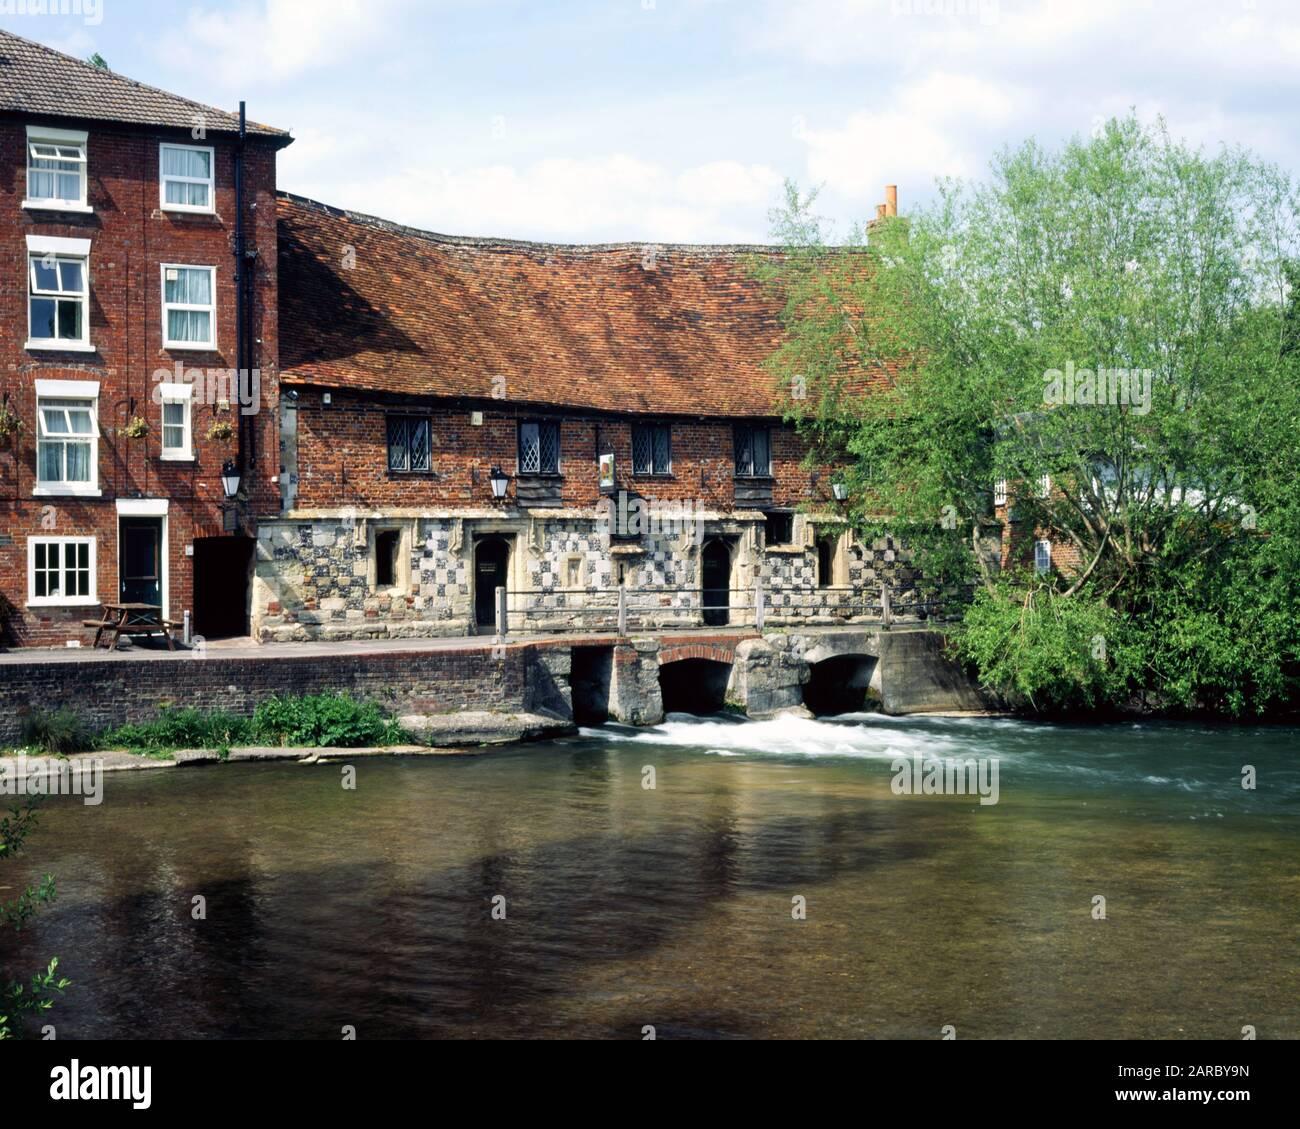 The old Mill, Harnham, Salisbury, Wiltshire, England. Stock Photo